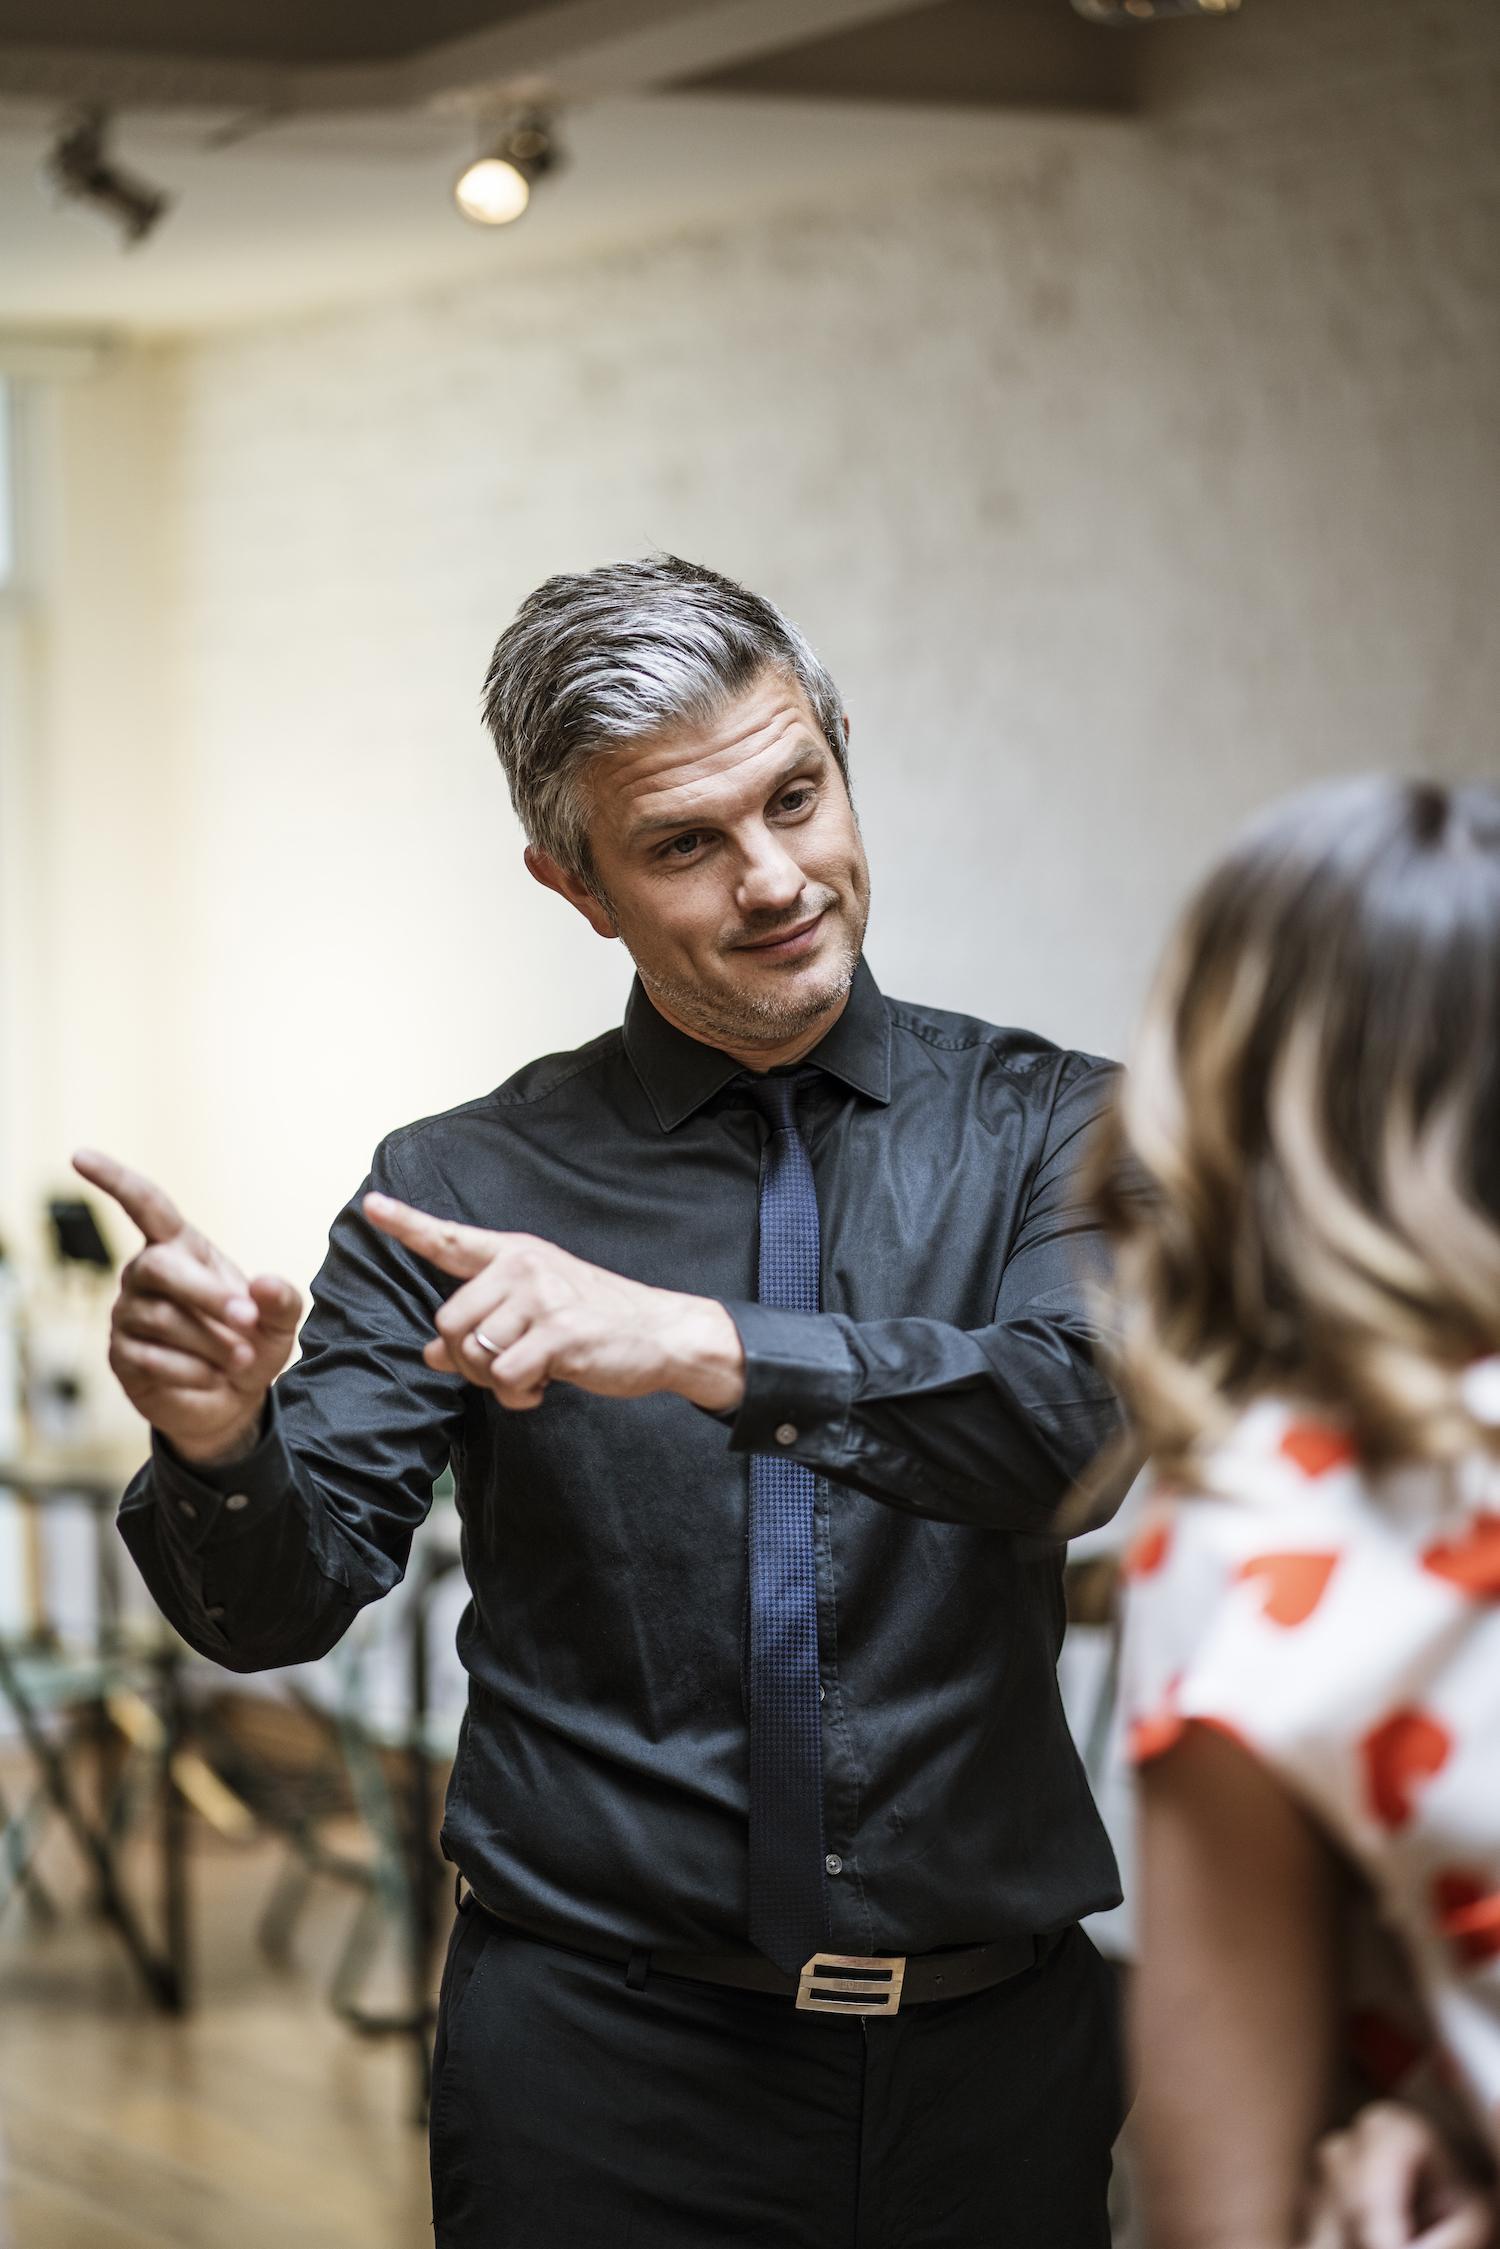 La leçon de tango d'Elodie de Sélys et Benjamin Deceuninck